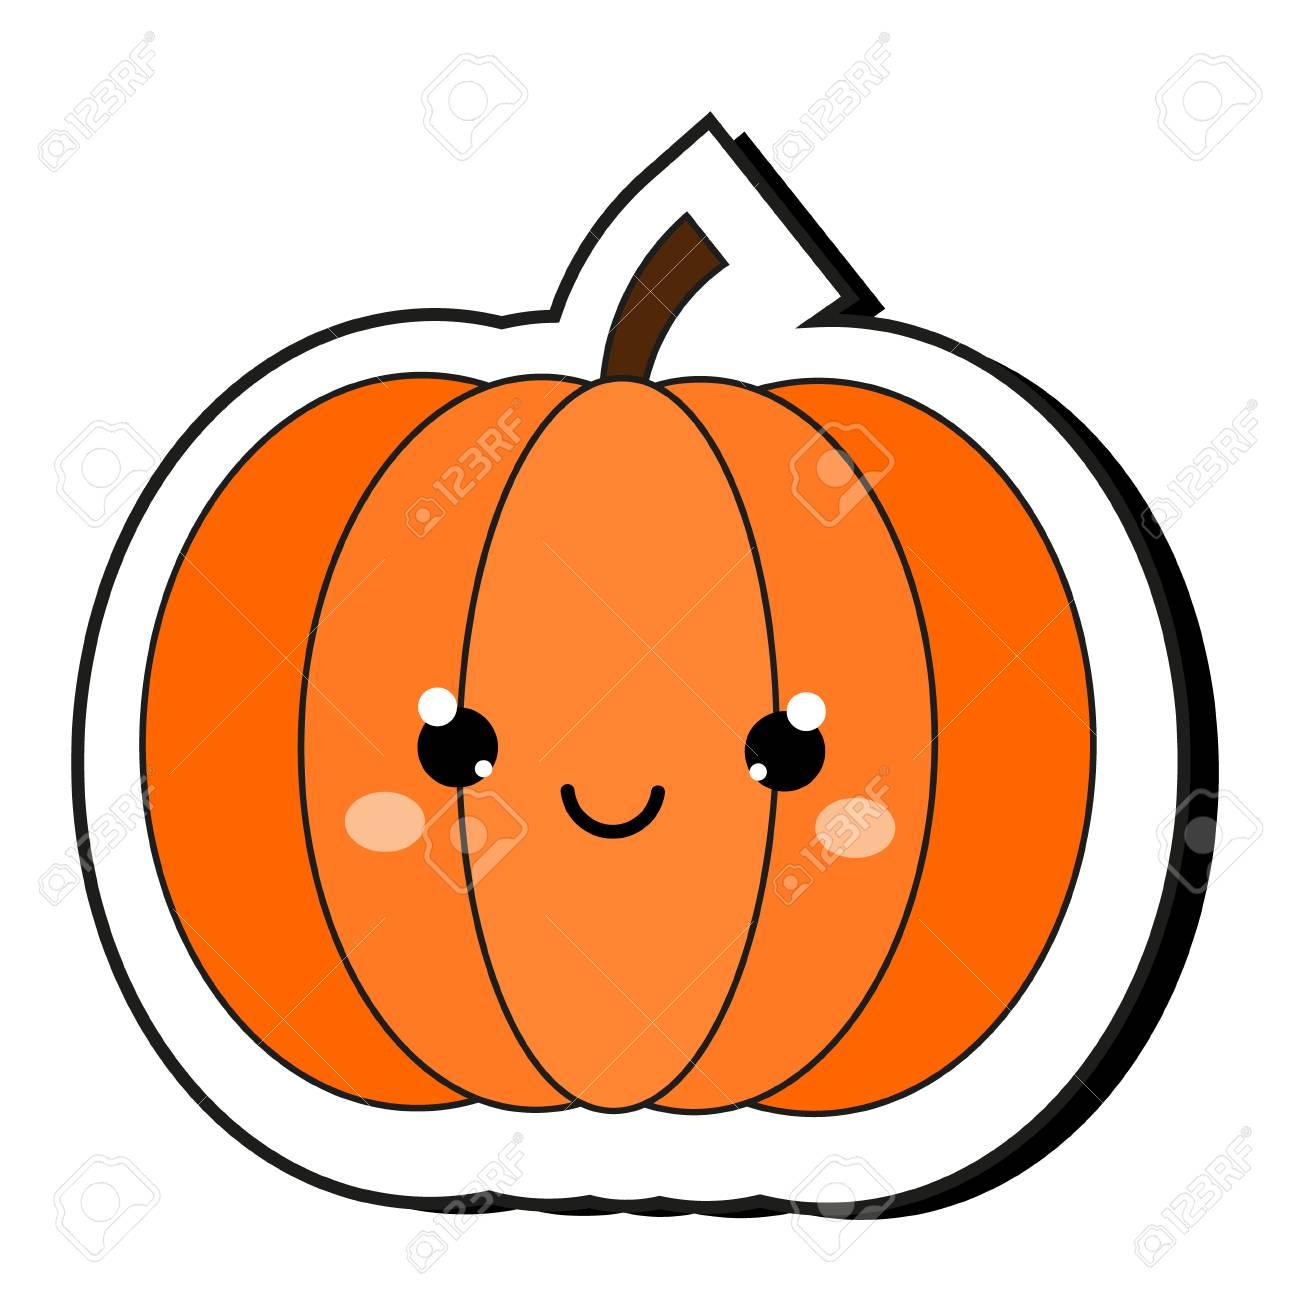 Cute pumpkin Halloween sticker. Isolaed clip art in kawaii style. - 106696746